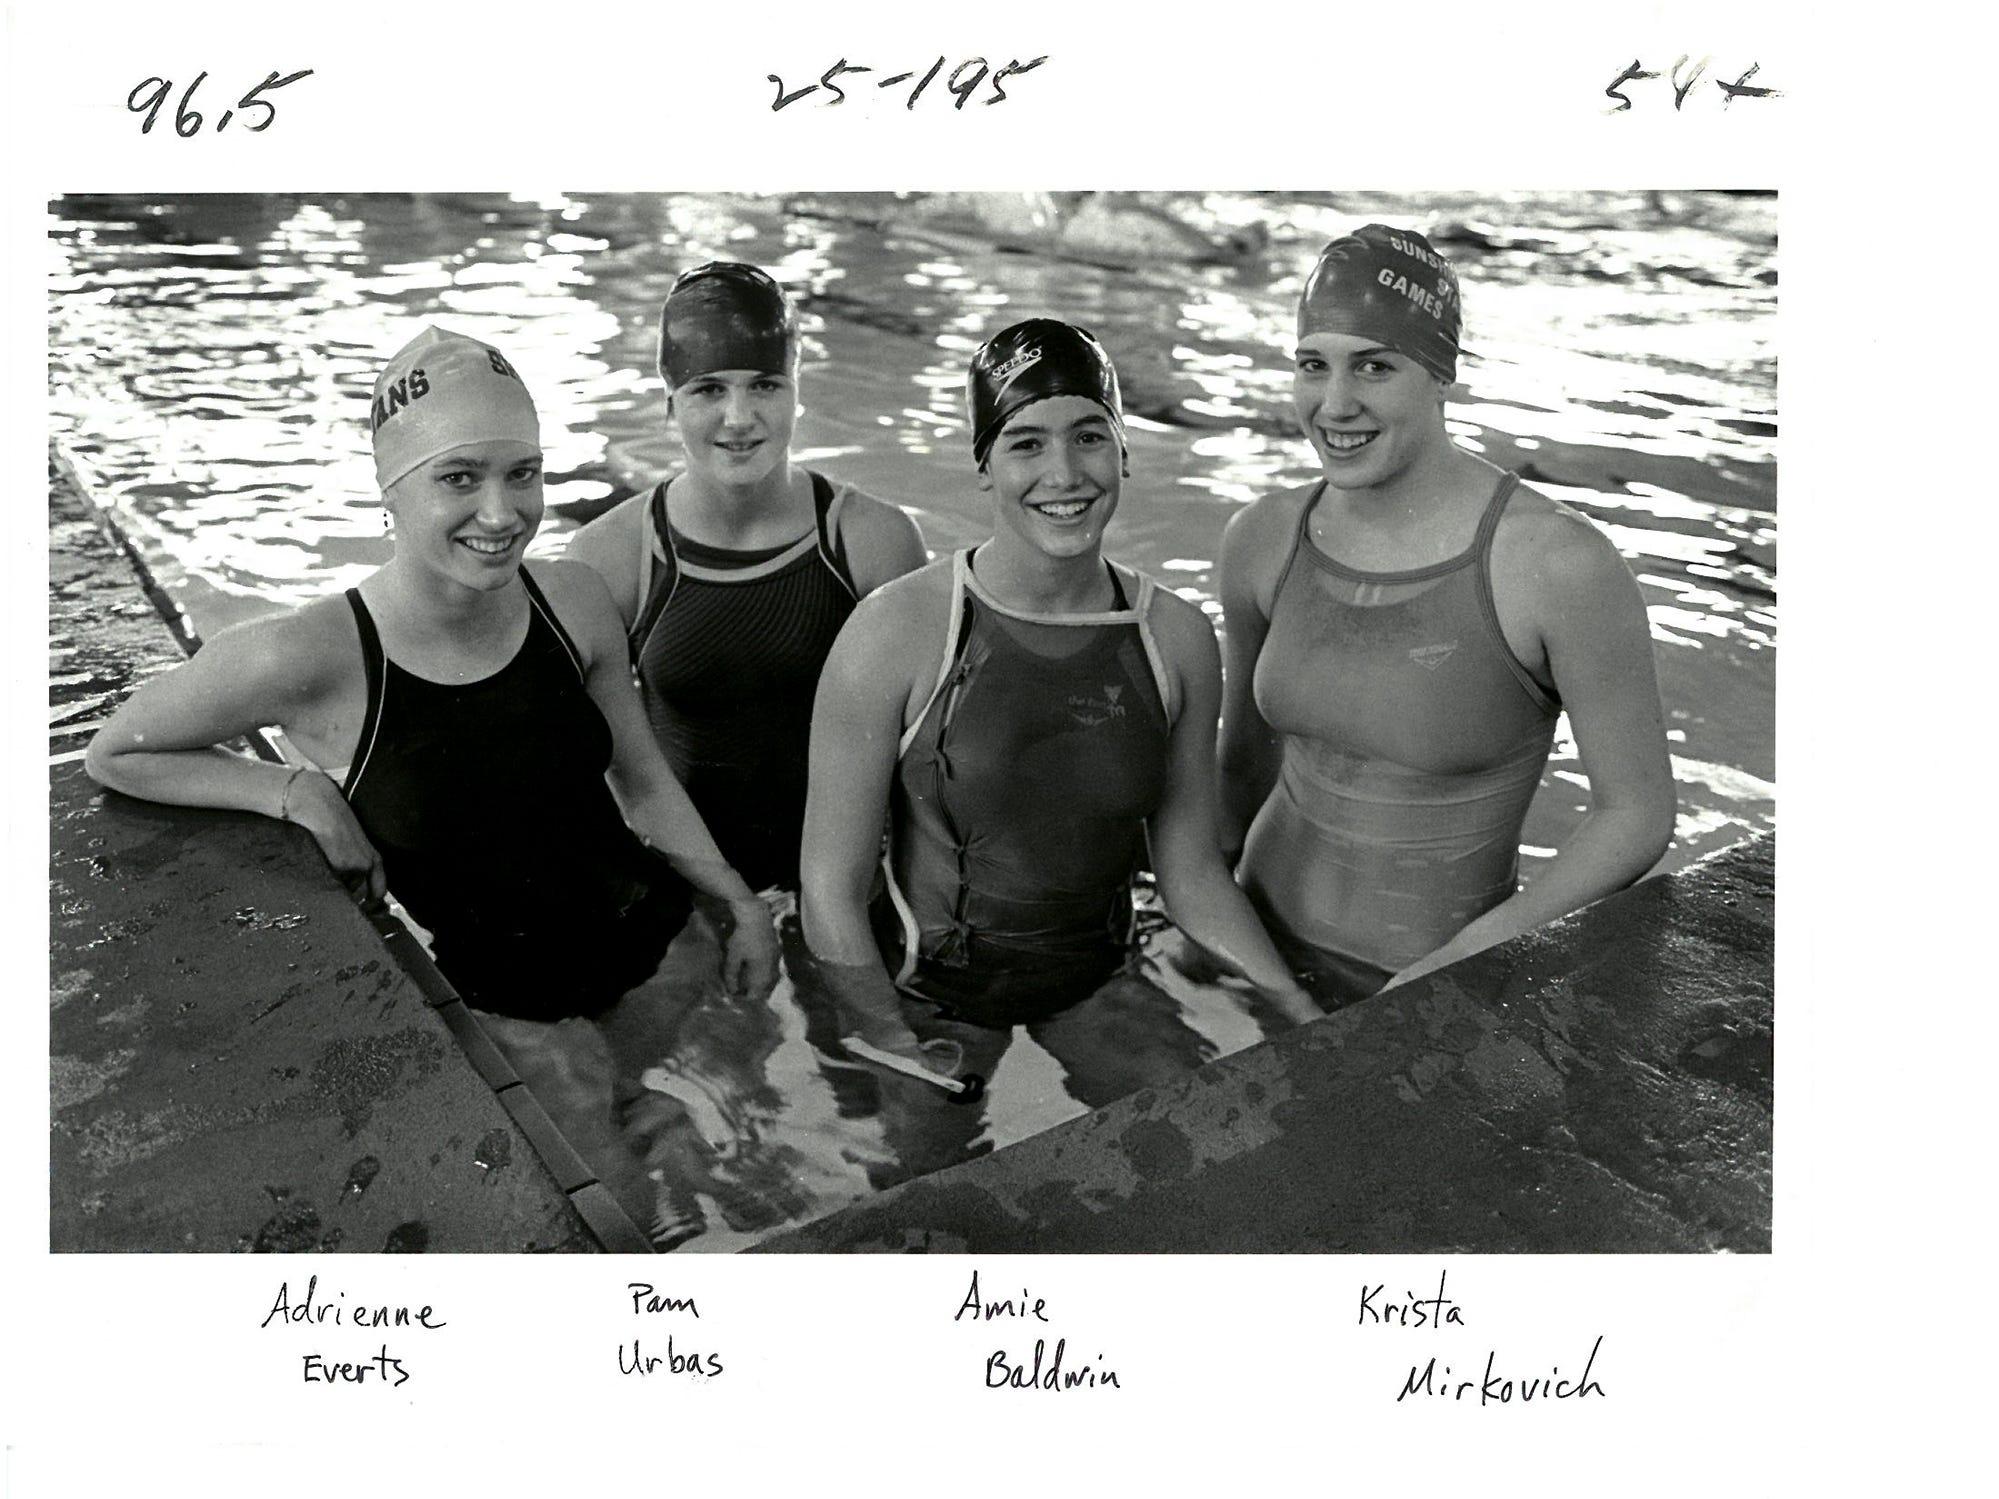 11/17/87Sports Swimmers Print